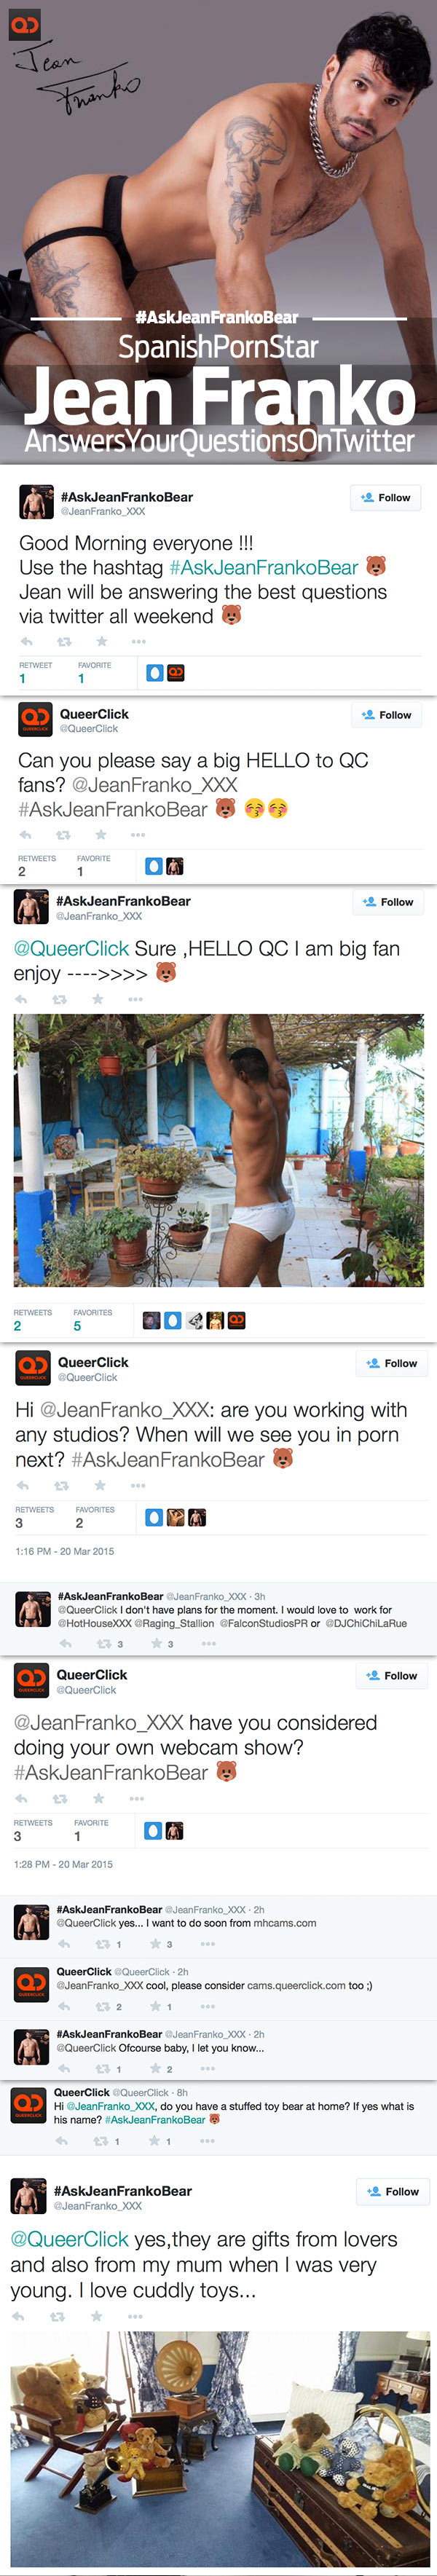 Spanish Porn Star Jean Franko Answers QC Readers Questions On Twitter - #AskJeanFrankoBear